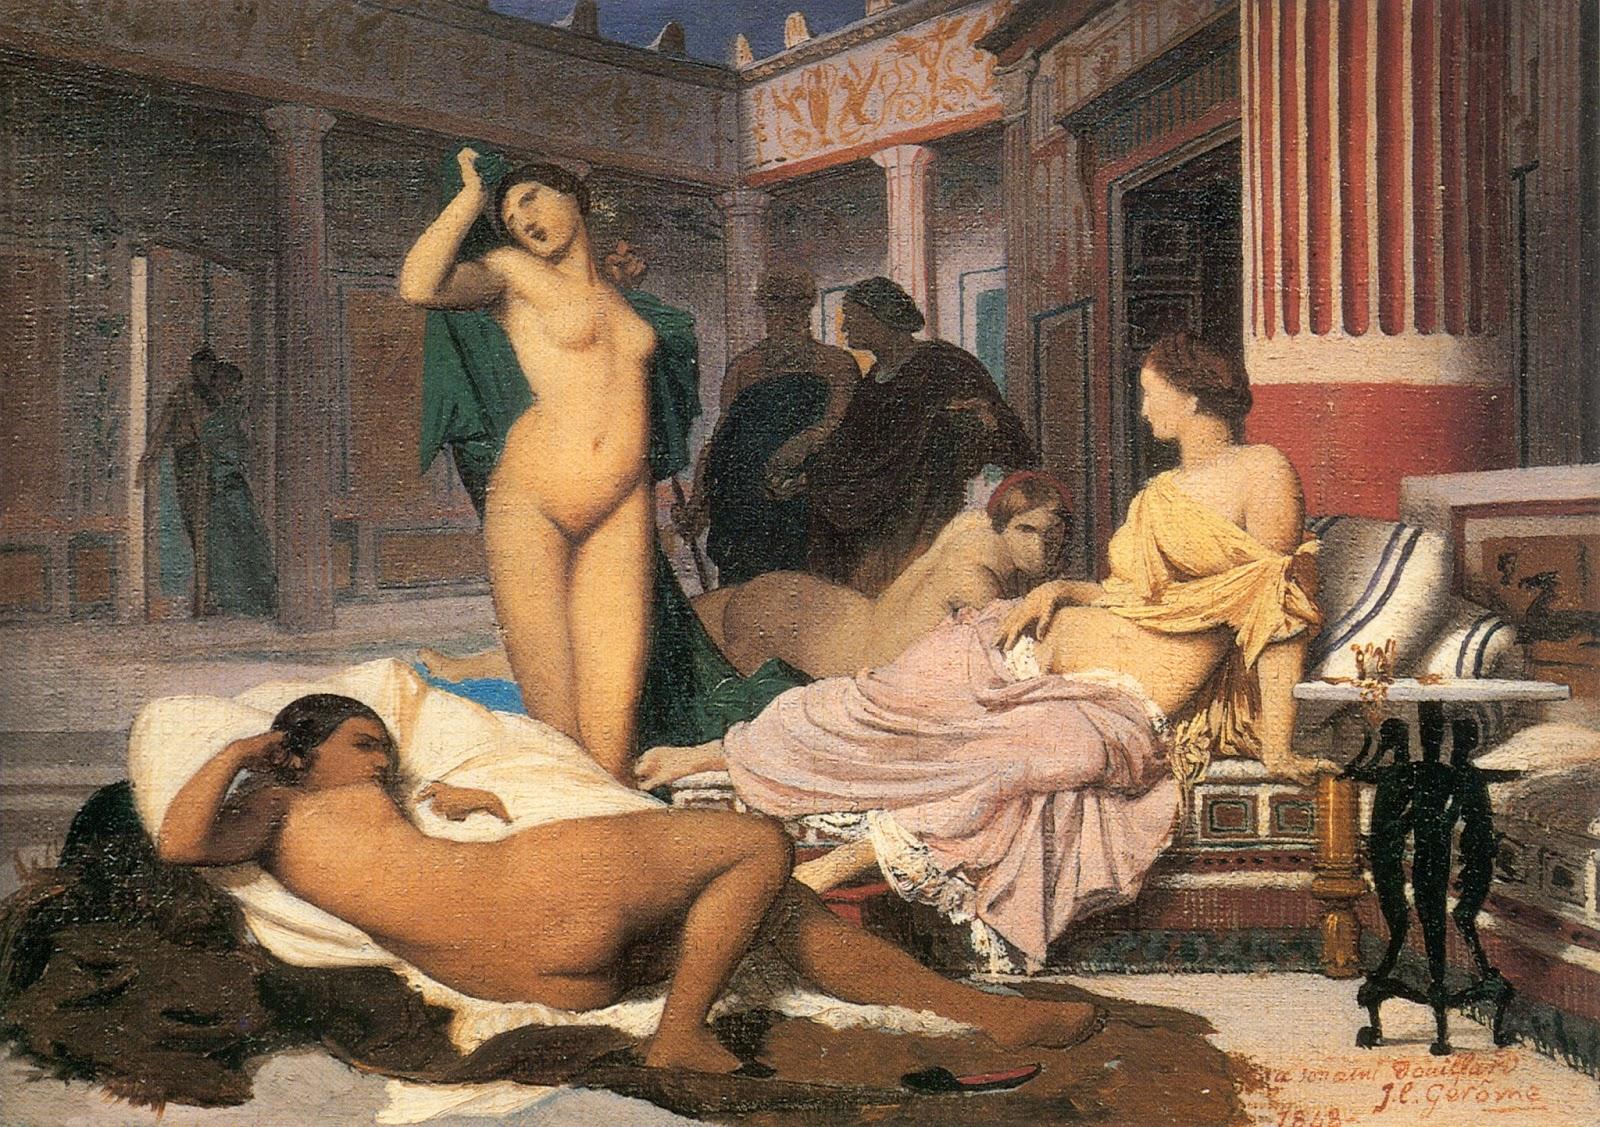 istoricheskoe-seks-s-korolyami-video